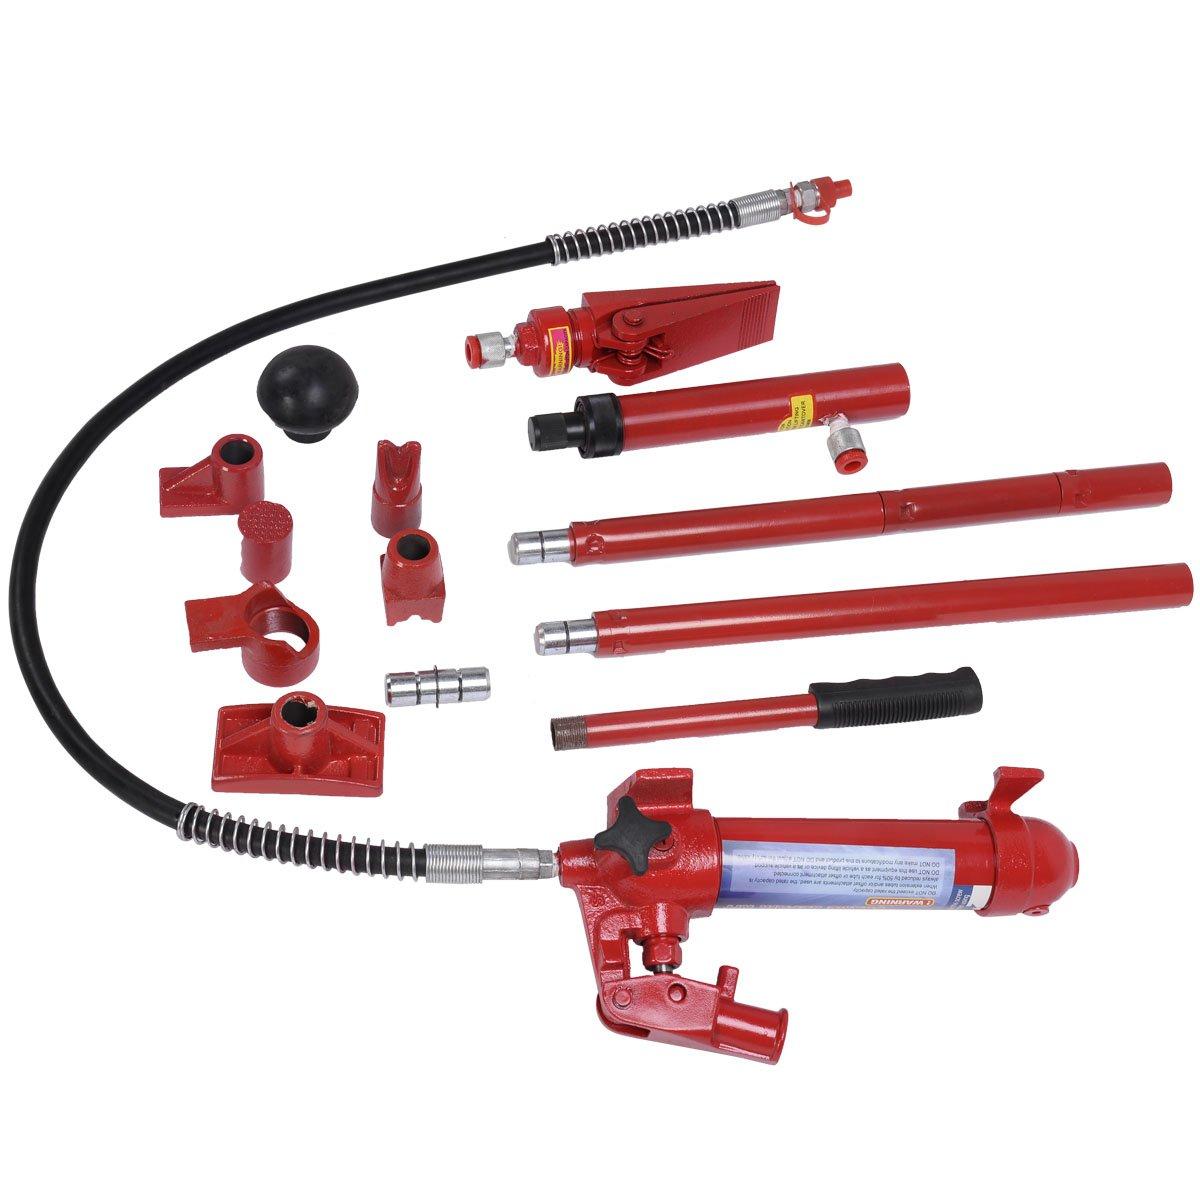 Goplus 4 Ton Porta Power Hydraulic Jack Body Frame Repair Kit Auto Shop Tool Heavy Set w/ Carrying Case by Goplus (Image #3)